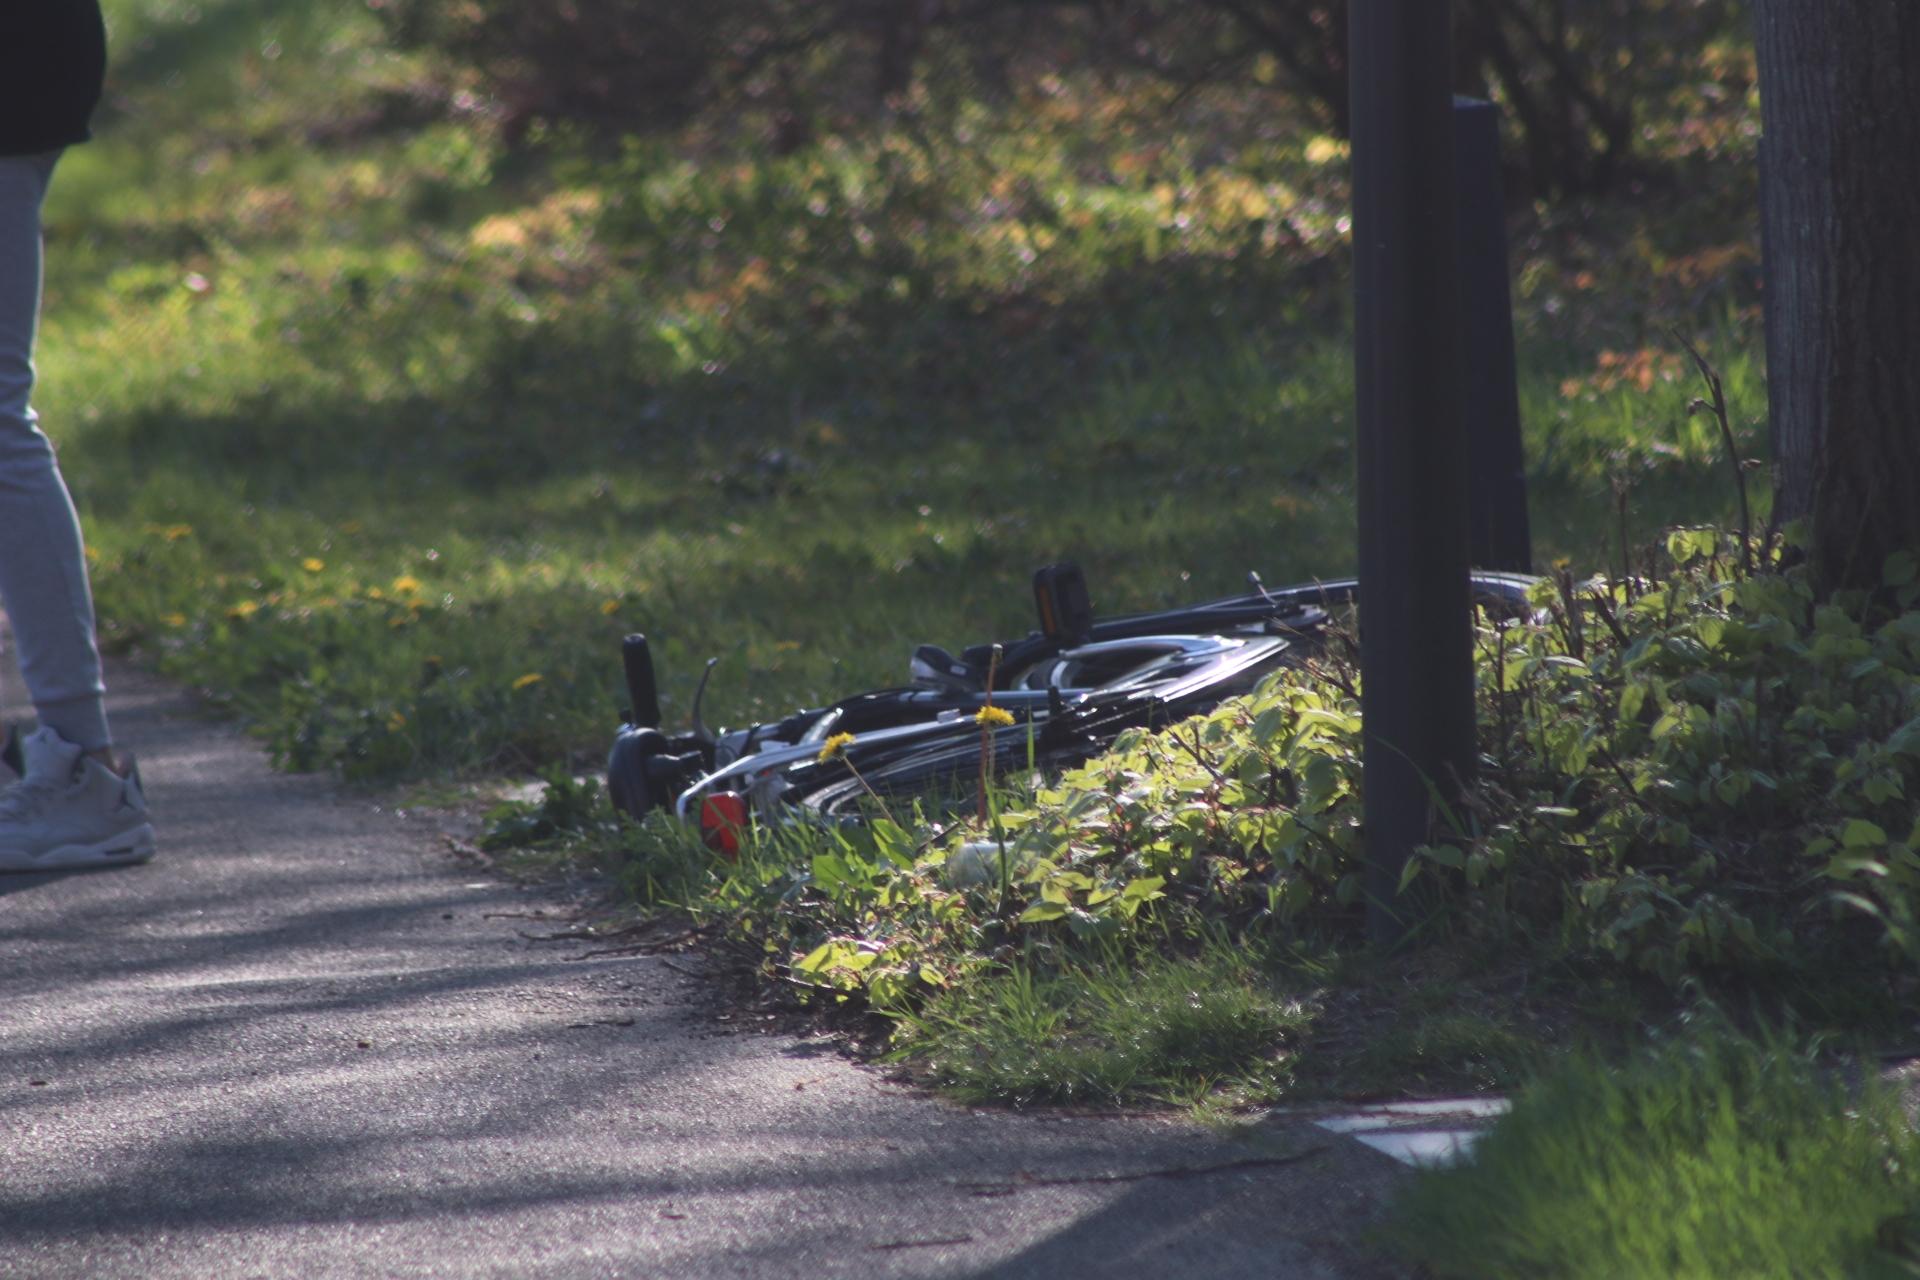 Fietser gewond na botsing met scooter in Apeldoorn